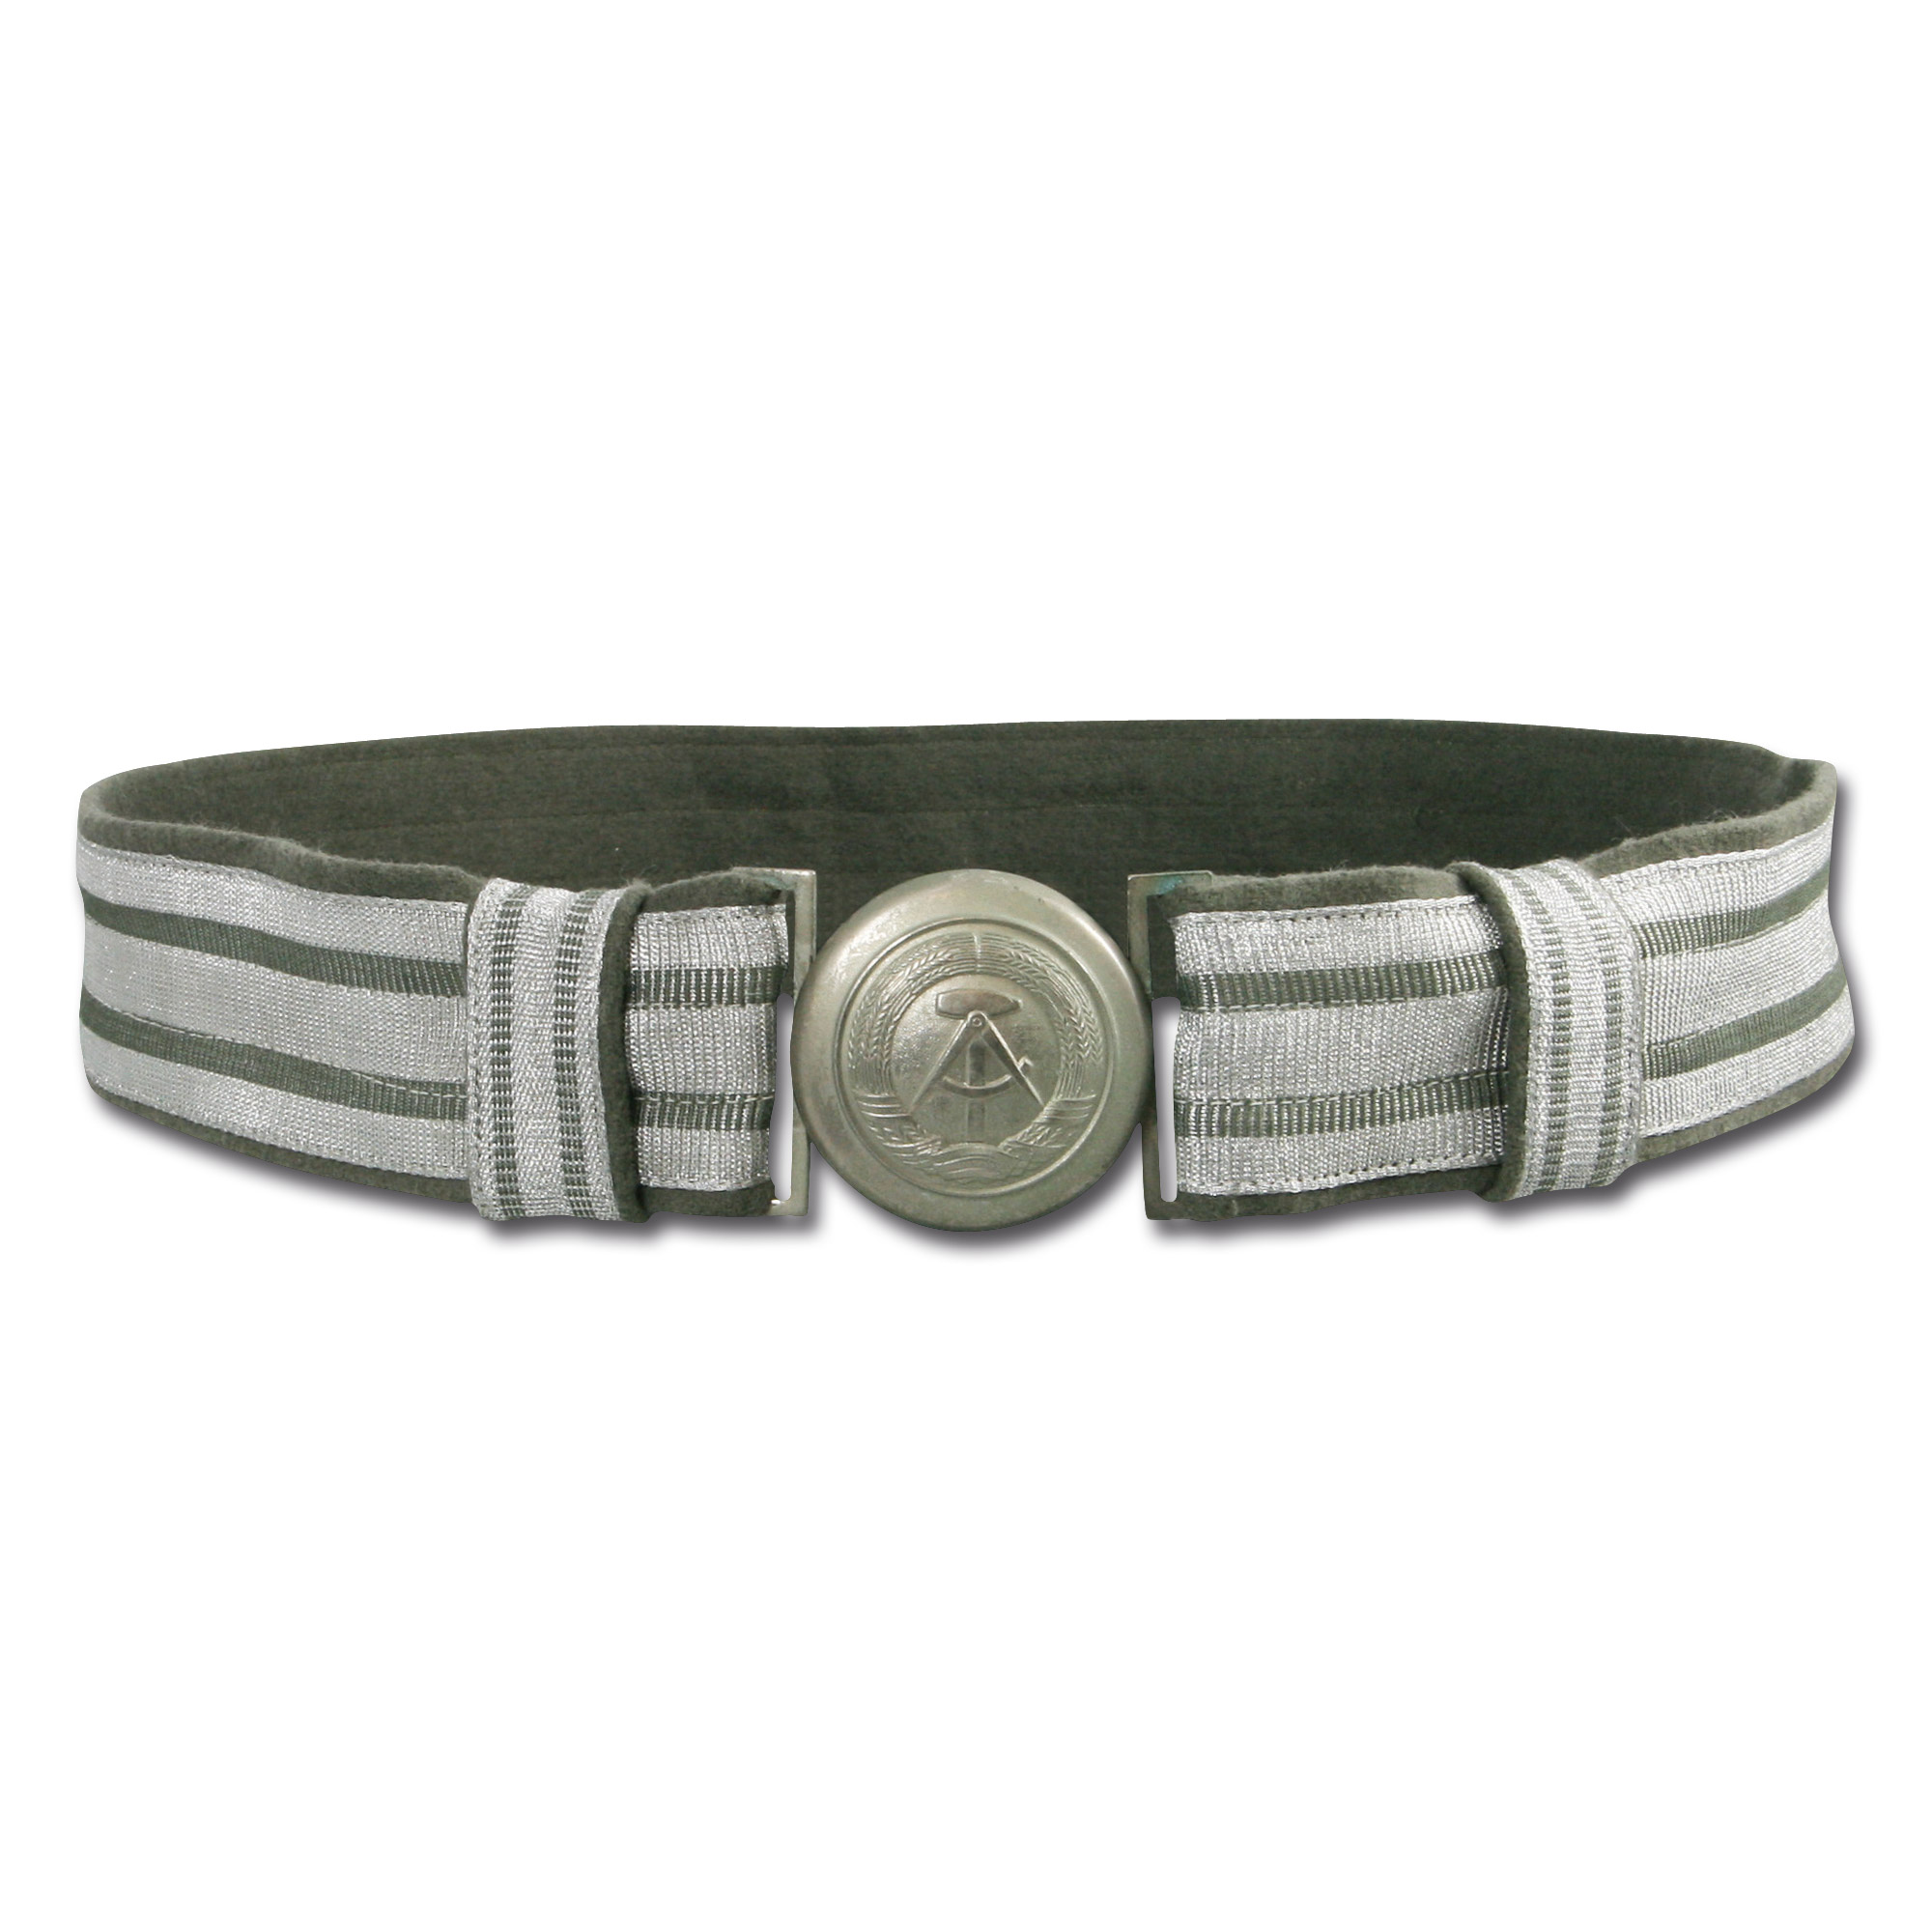 NVA Dress Belt